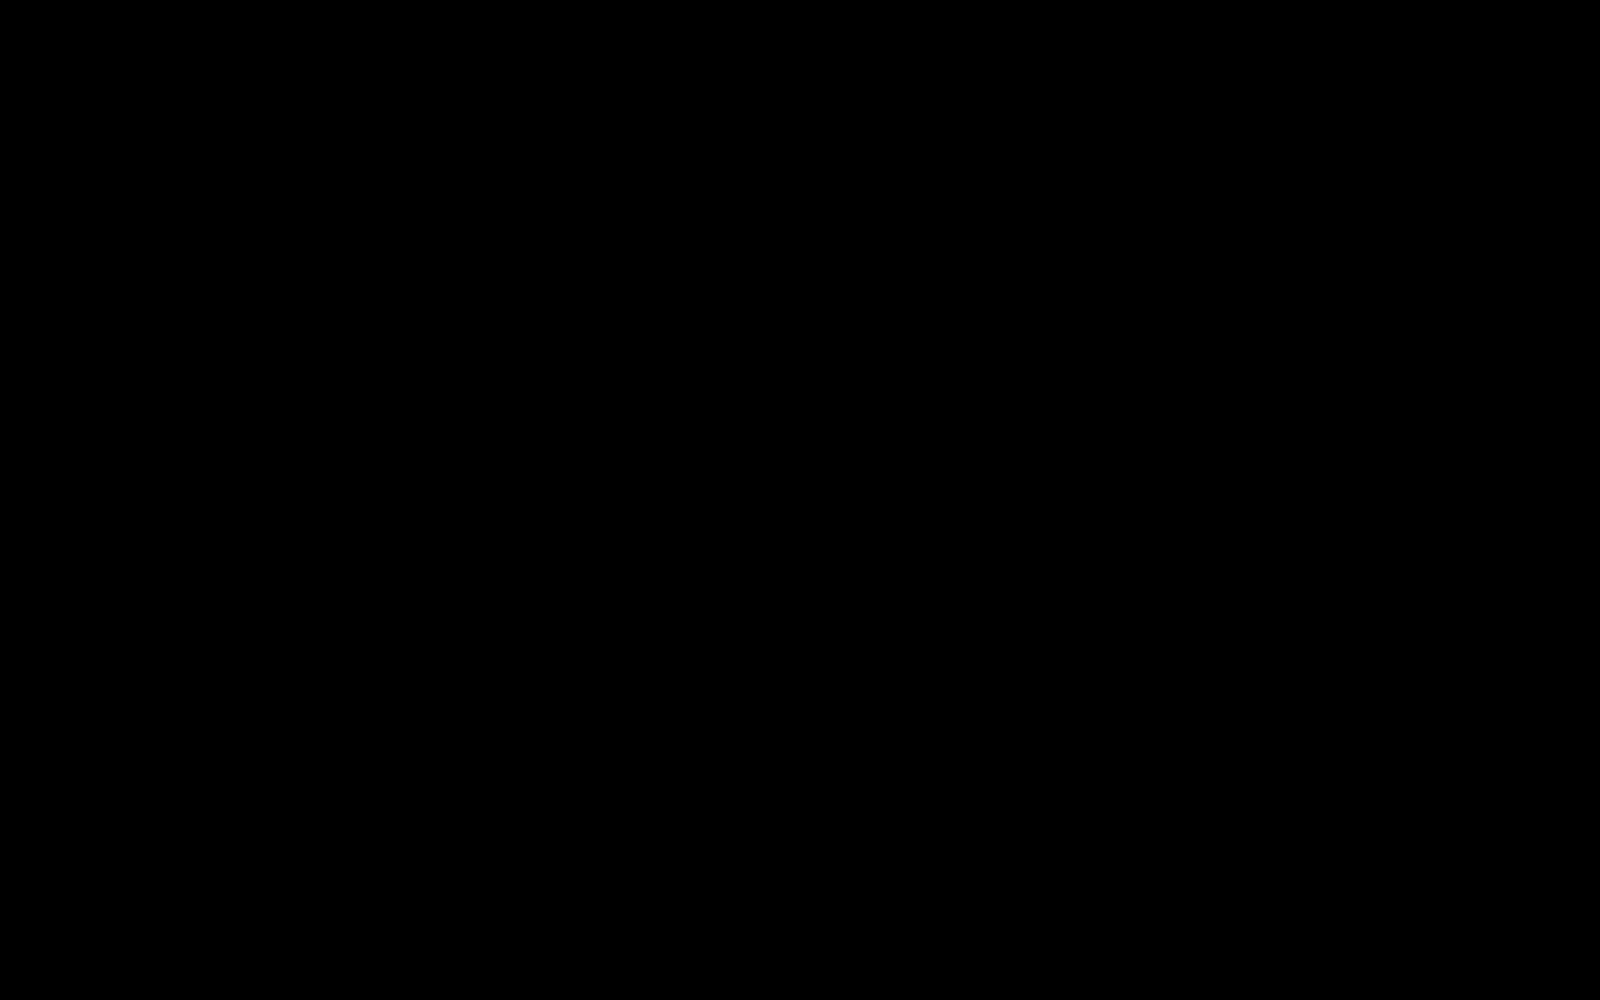 santorini-lalagkou